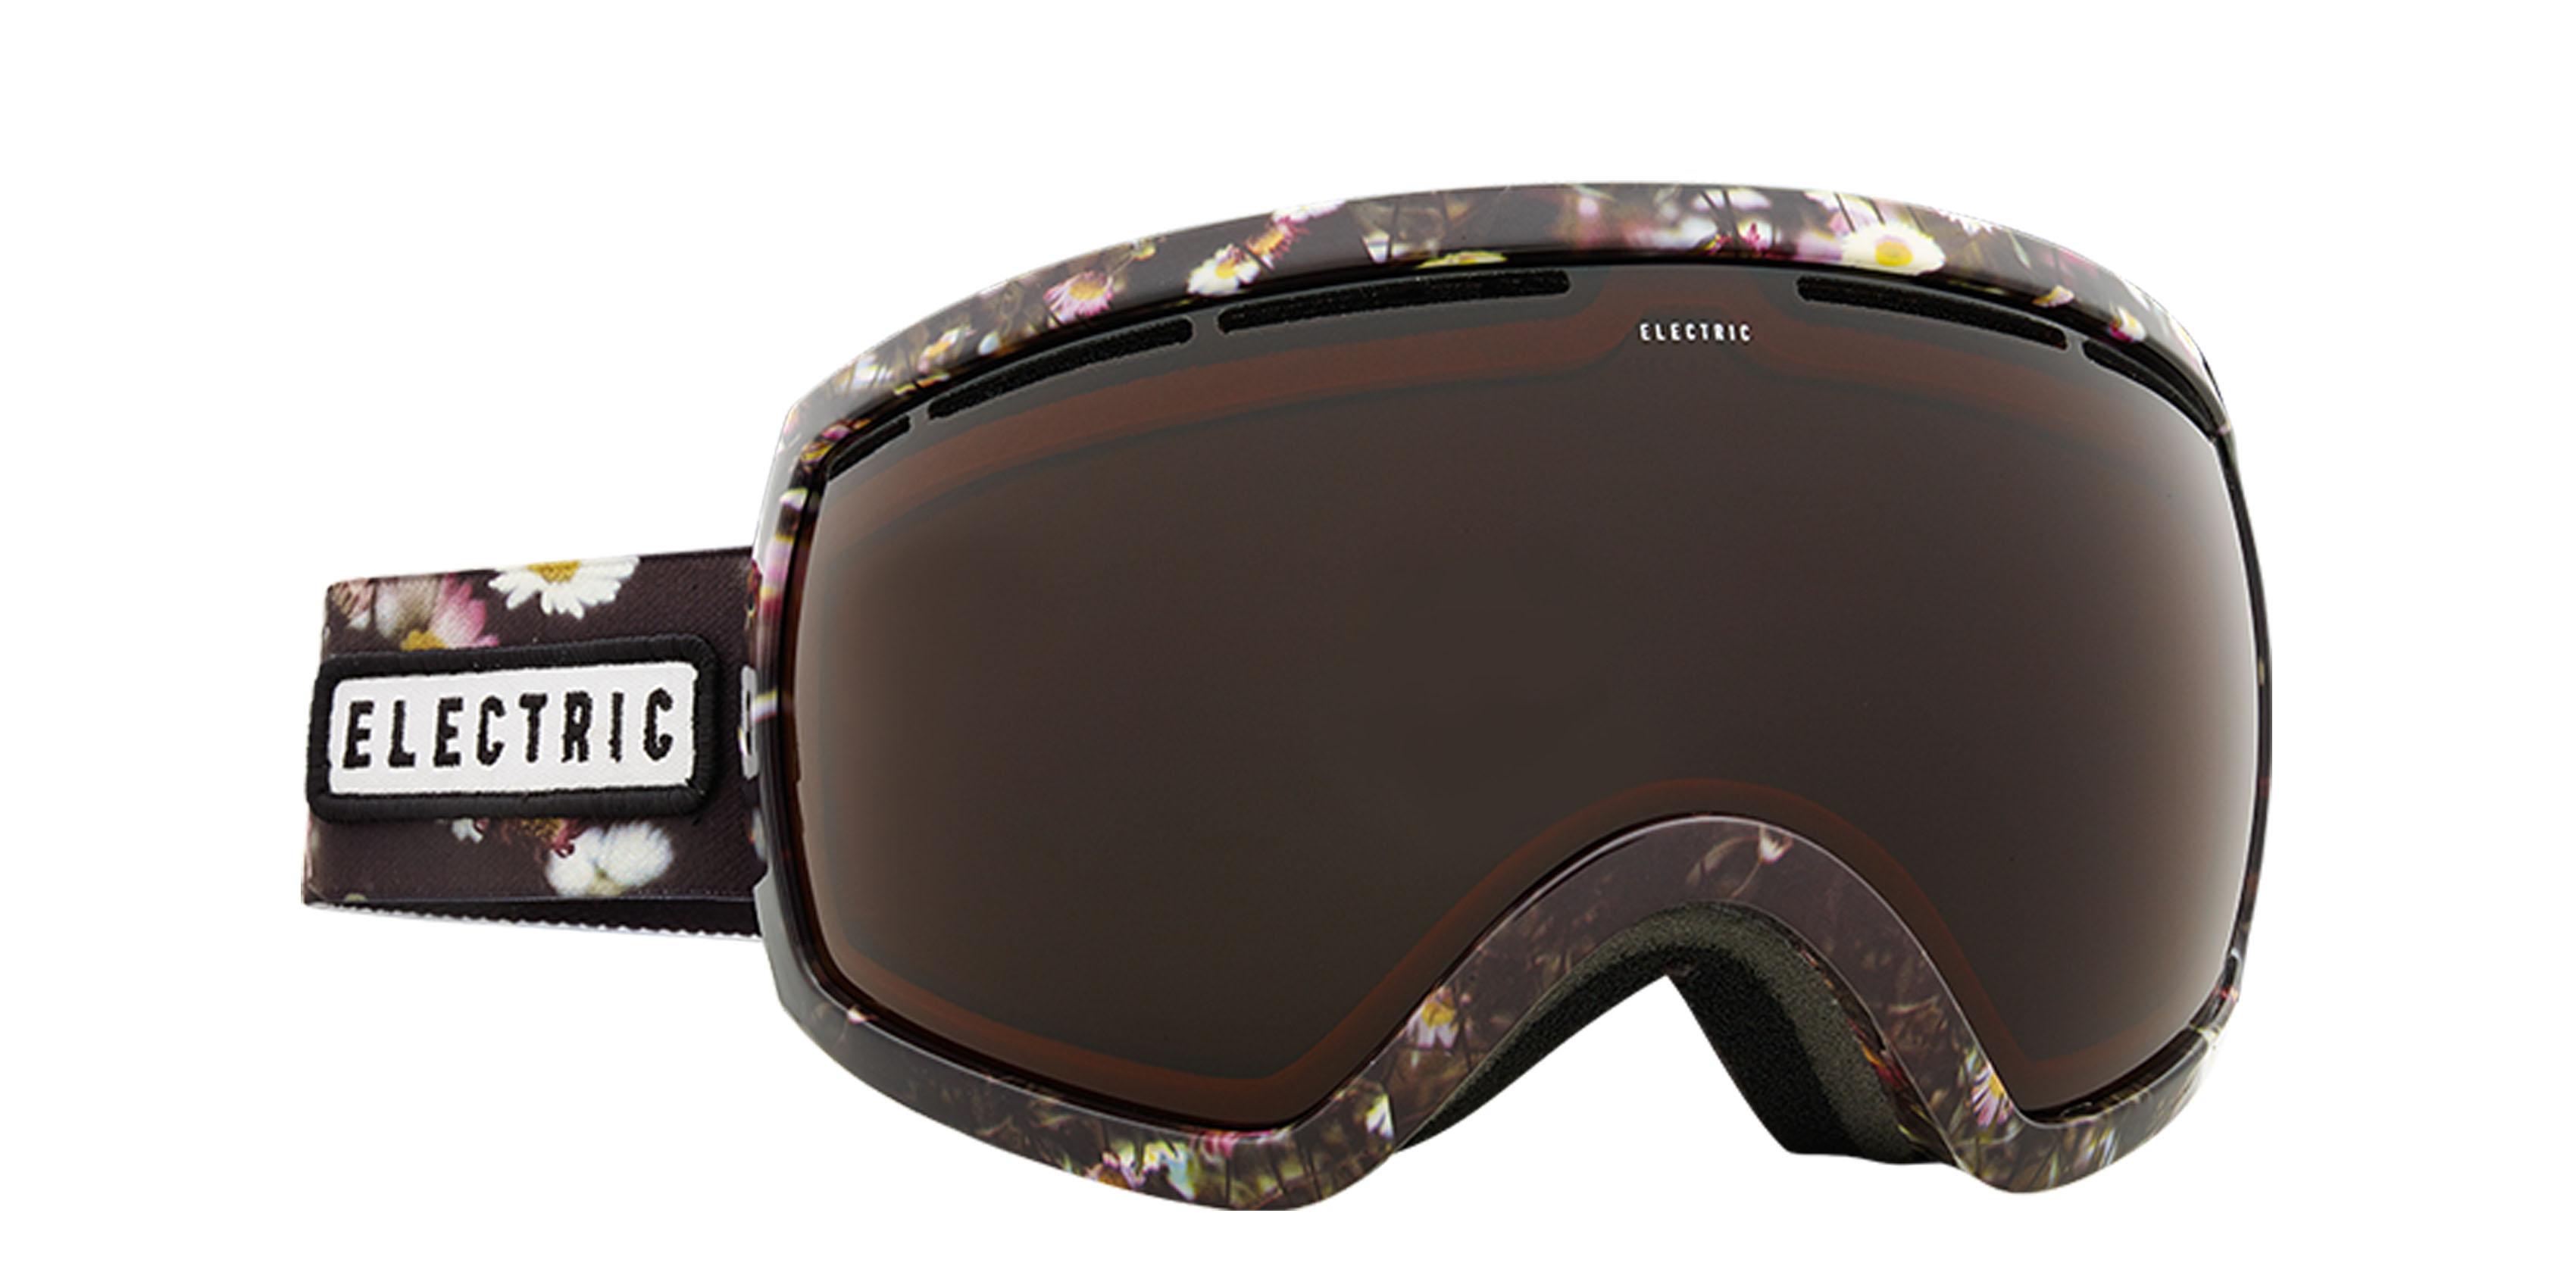 0d5b185c11e Sentinel Electric Goggles - EG2.5